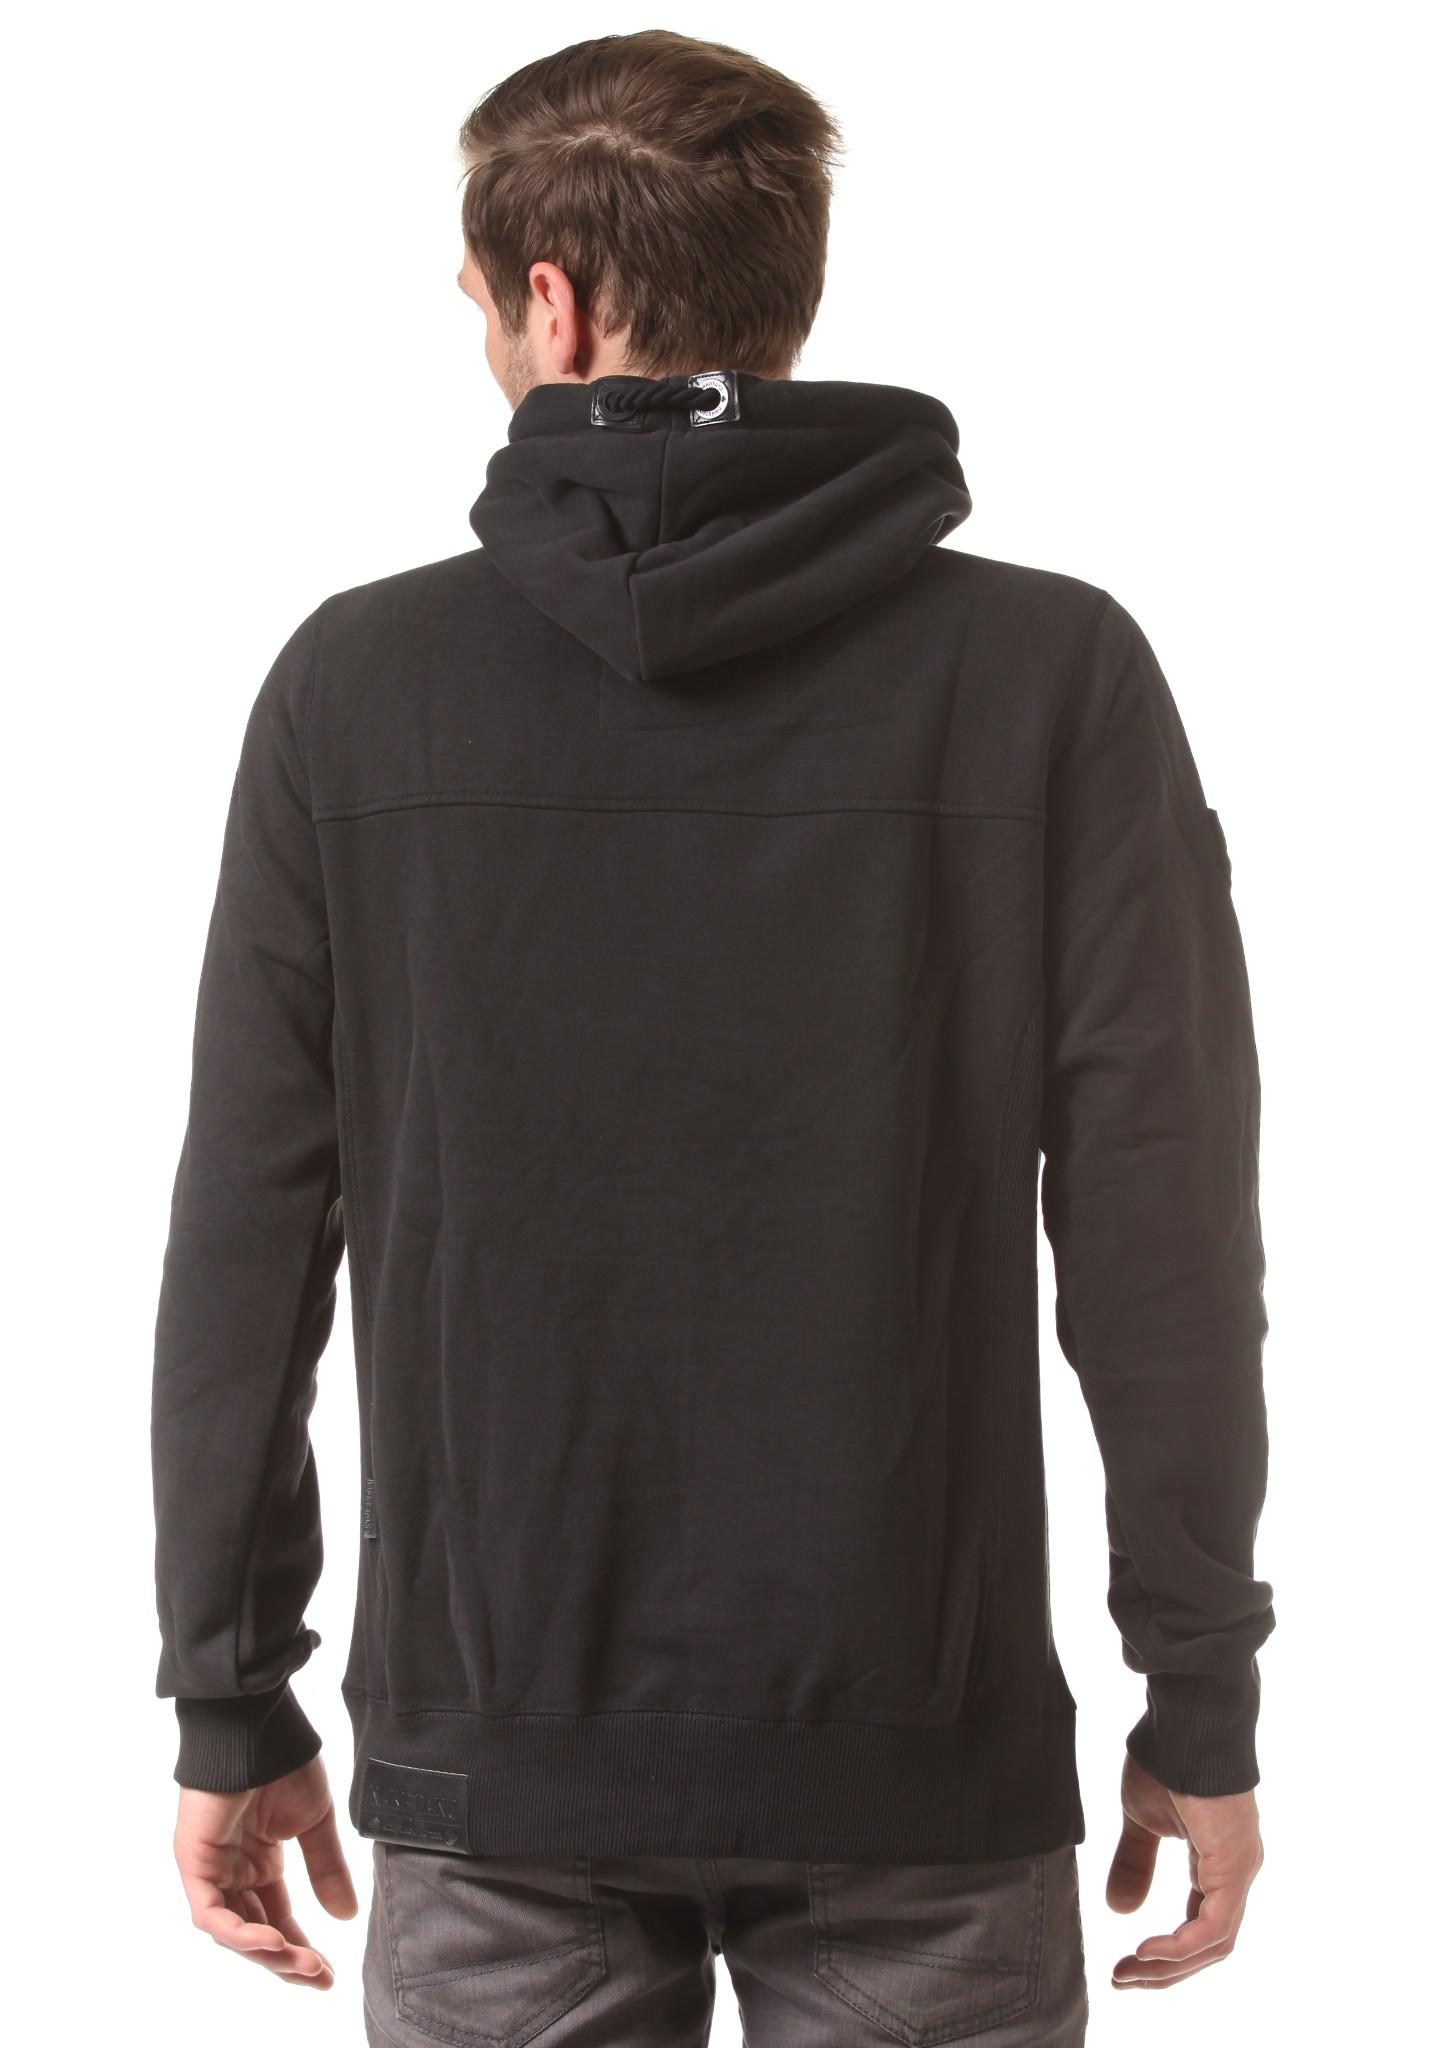 neu naketano pommes im weltall herren kapuzenpullover pullover hoodie ebay. Black Bedroom Furniture Sets. Home Design Ideas